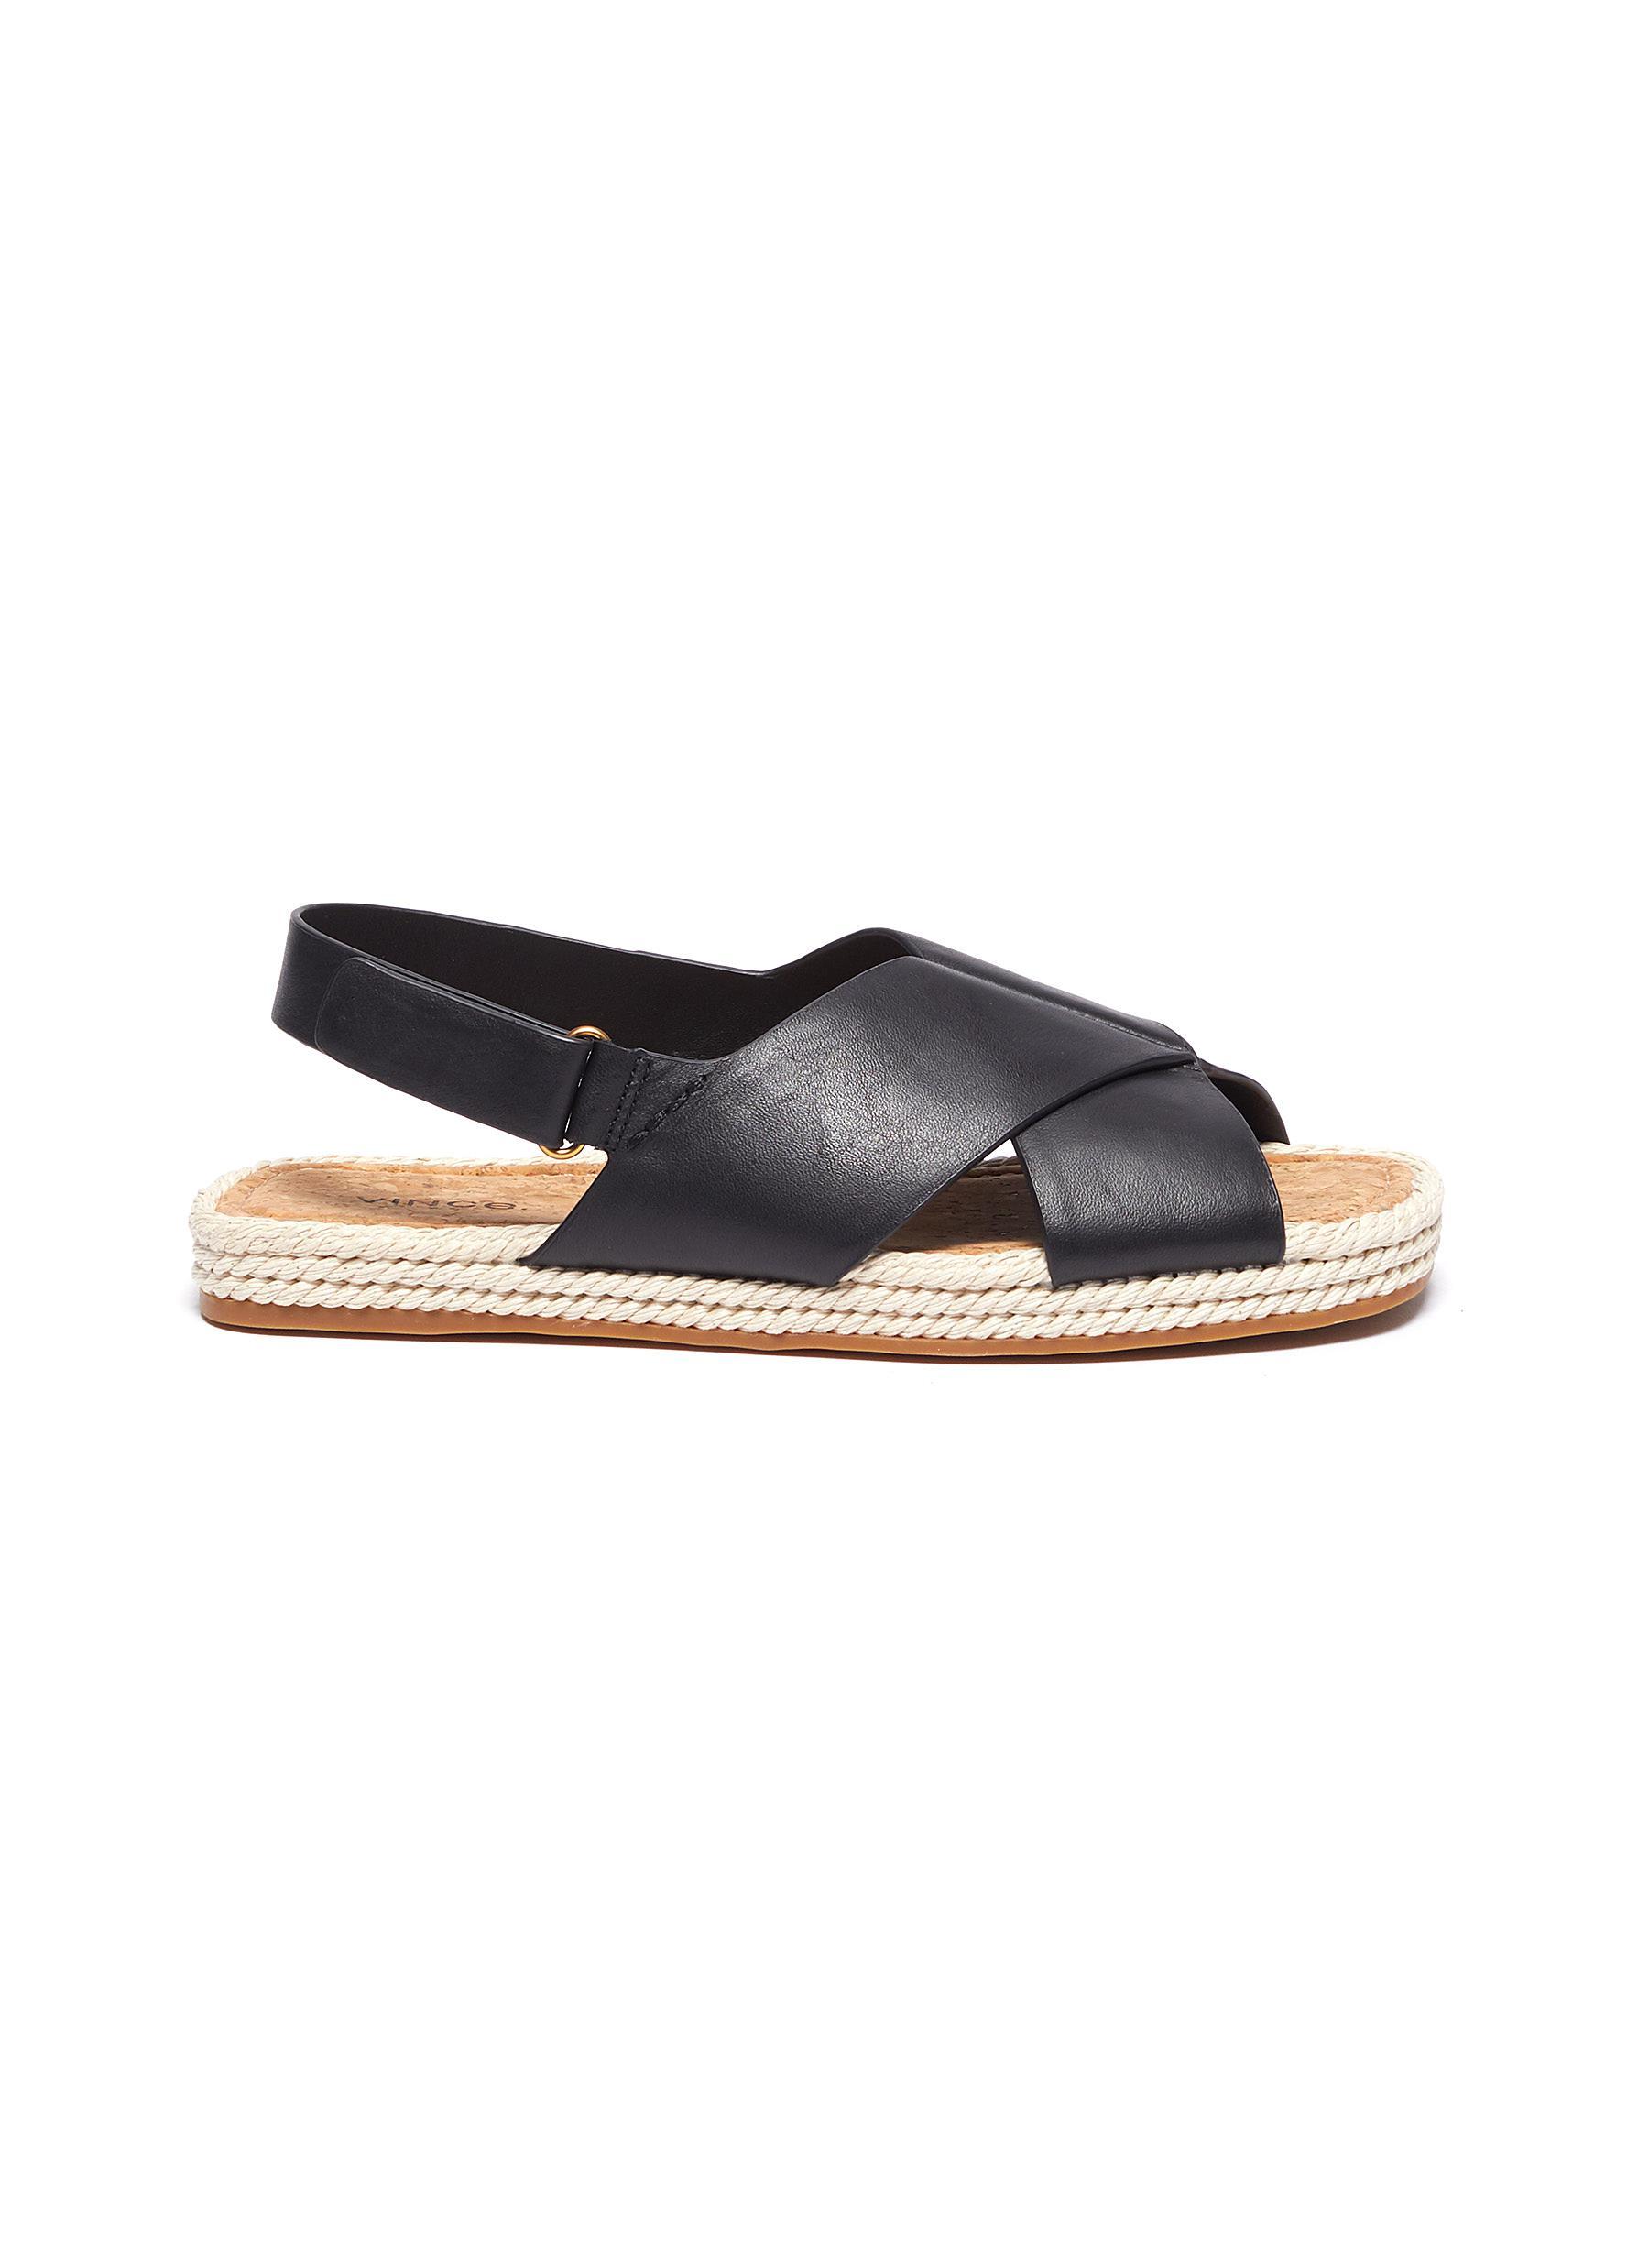 shop Vince 'Essen' cross strap slingback leather espadrille sandals online